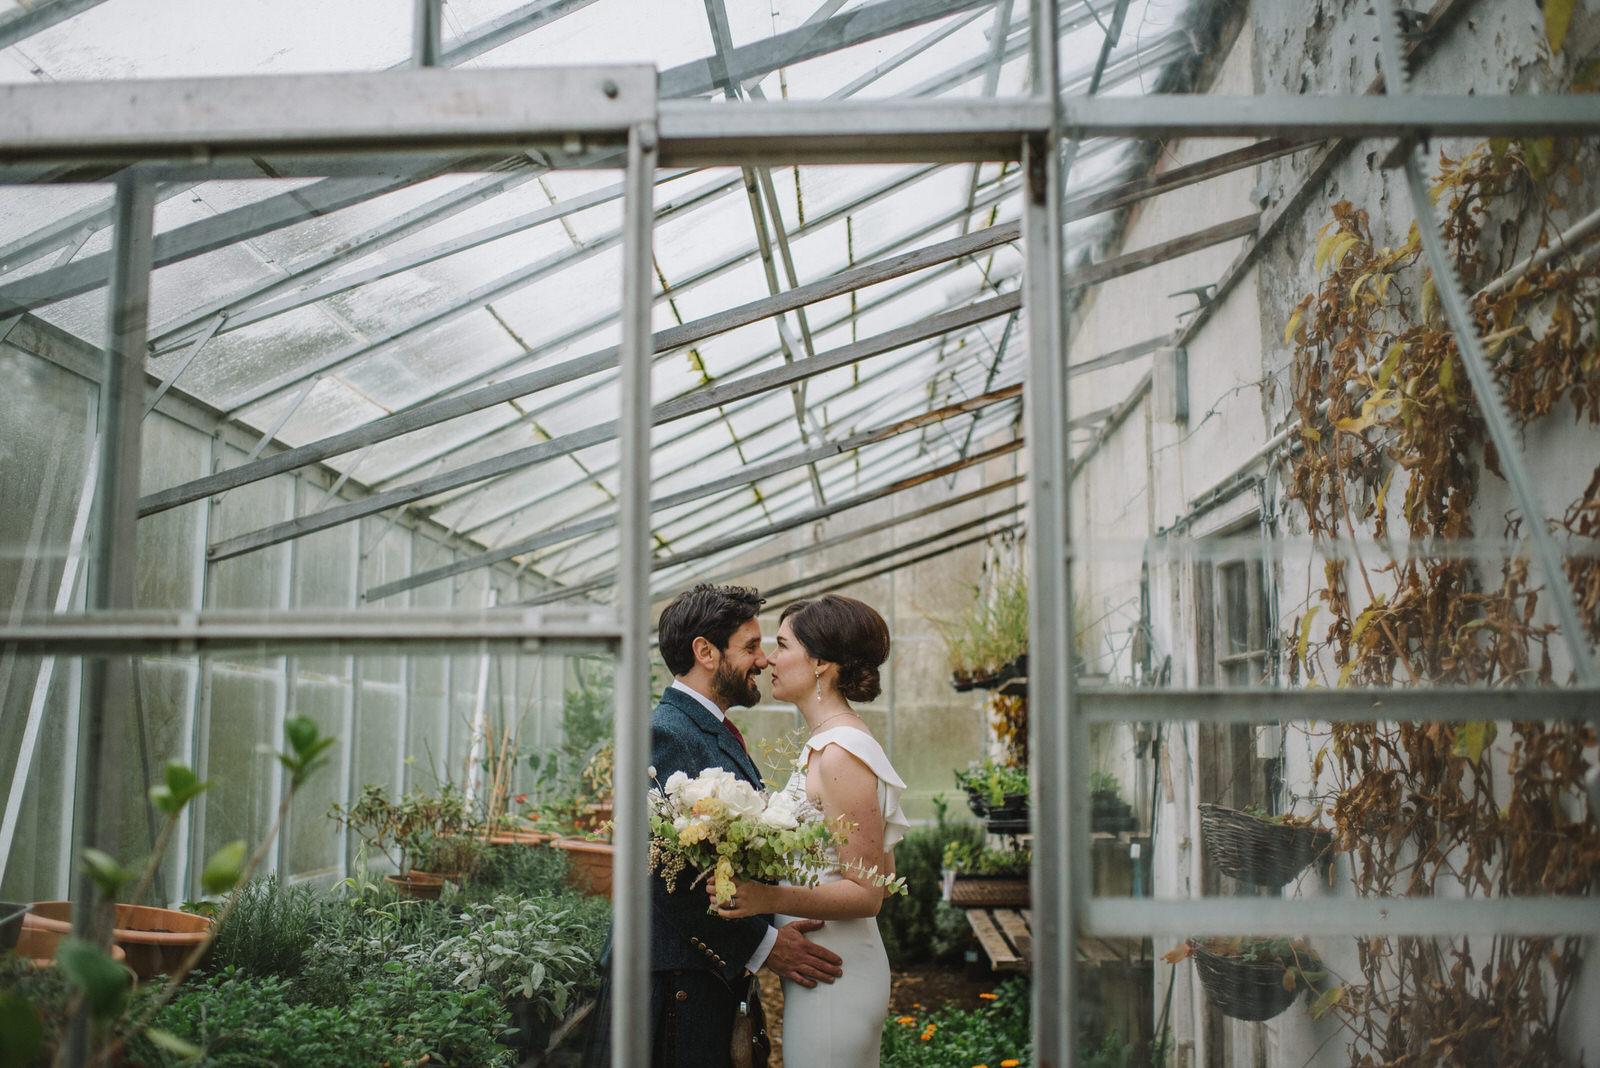 024-COLSTOUN-HOUSE-WEDDING-ALTERNATIVE-WEDDING-PHOTOGRAPHER-GLASGOW-WEDDING-PHOTOGRAPHER-STYLISH-SCOTTISH-WEDDING.JPG